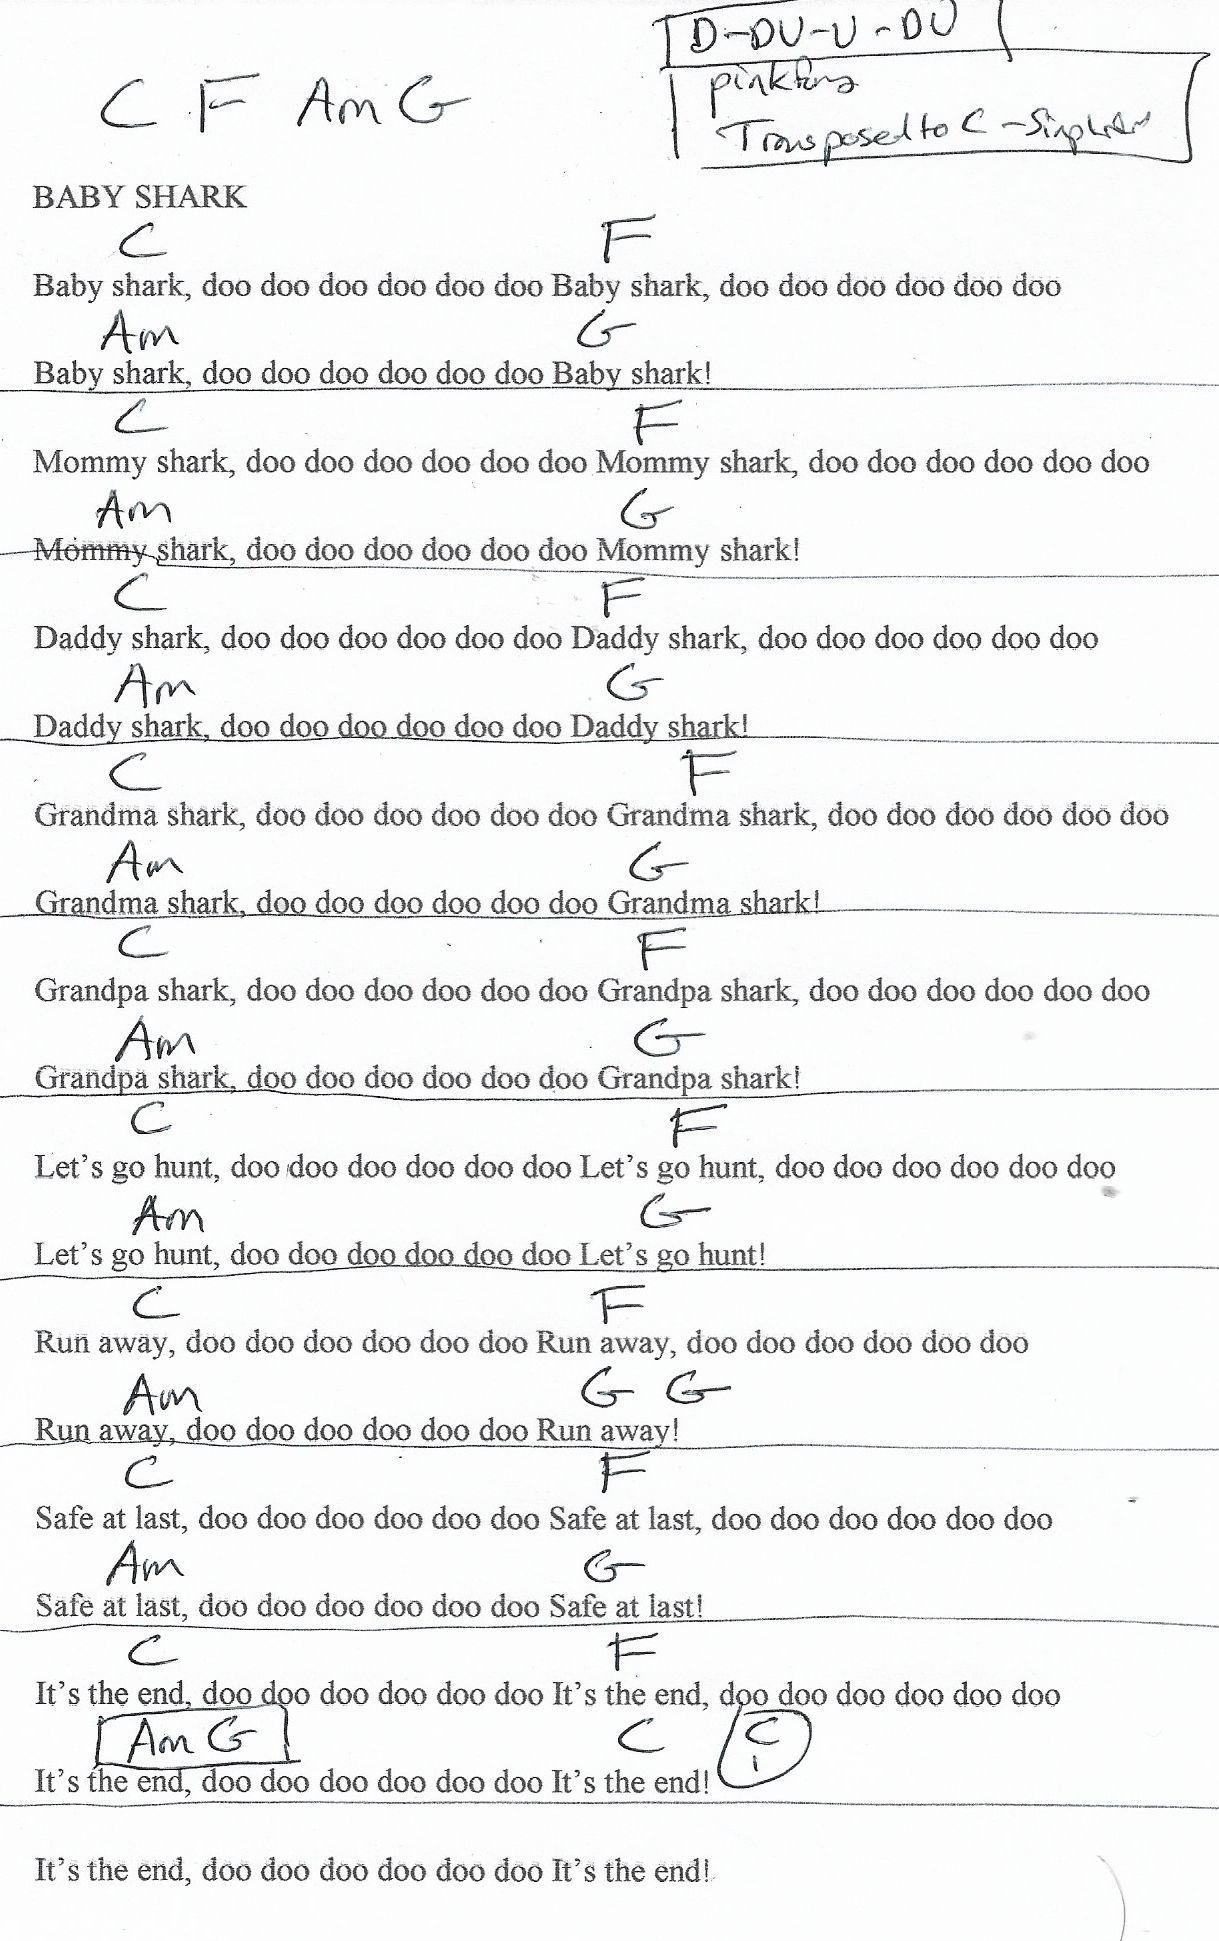 Baby Shark (PinkFong) Guitar Chord Chart in C Major ...